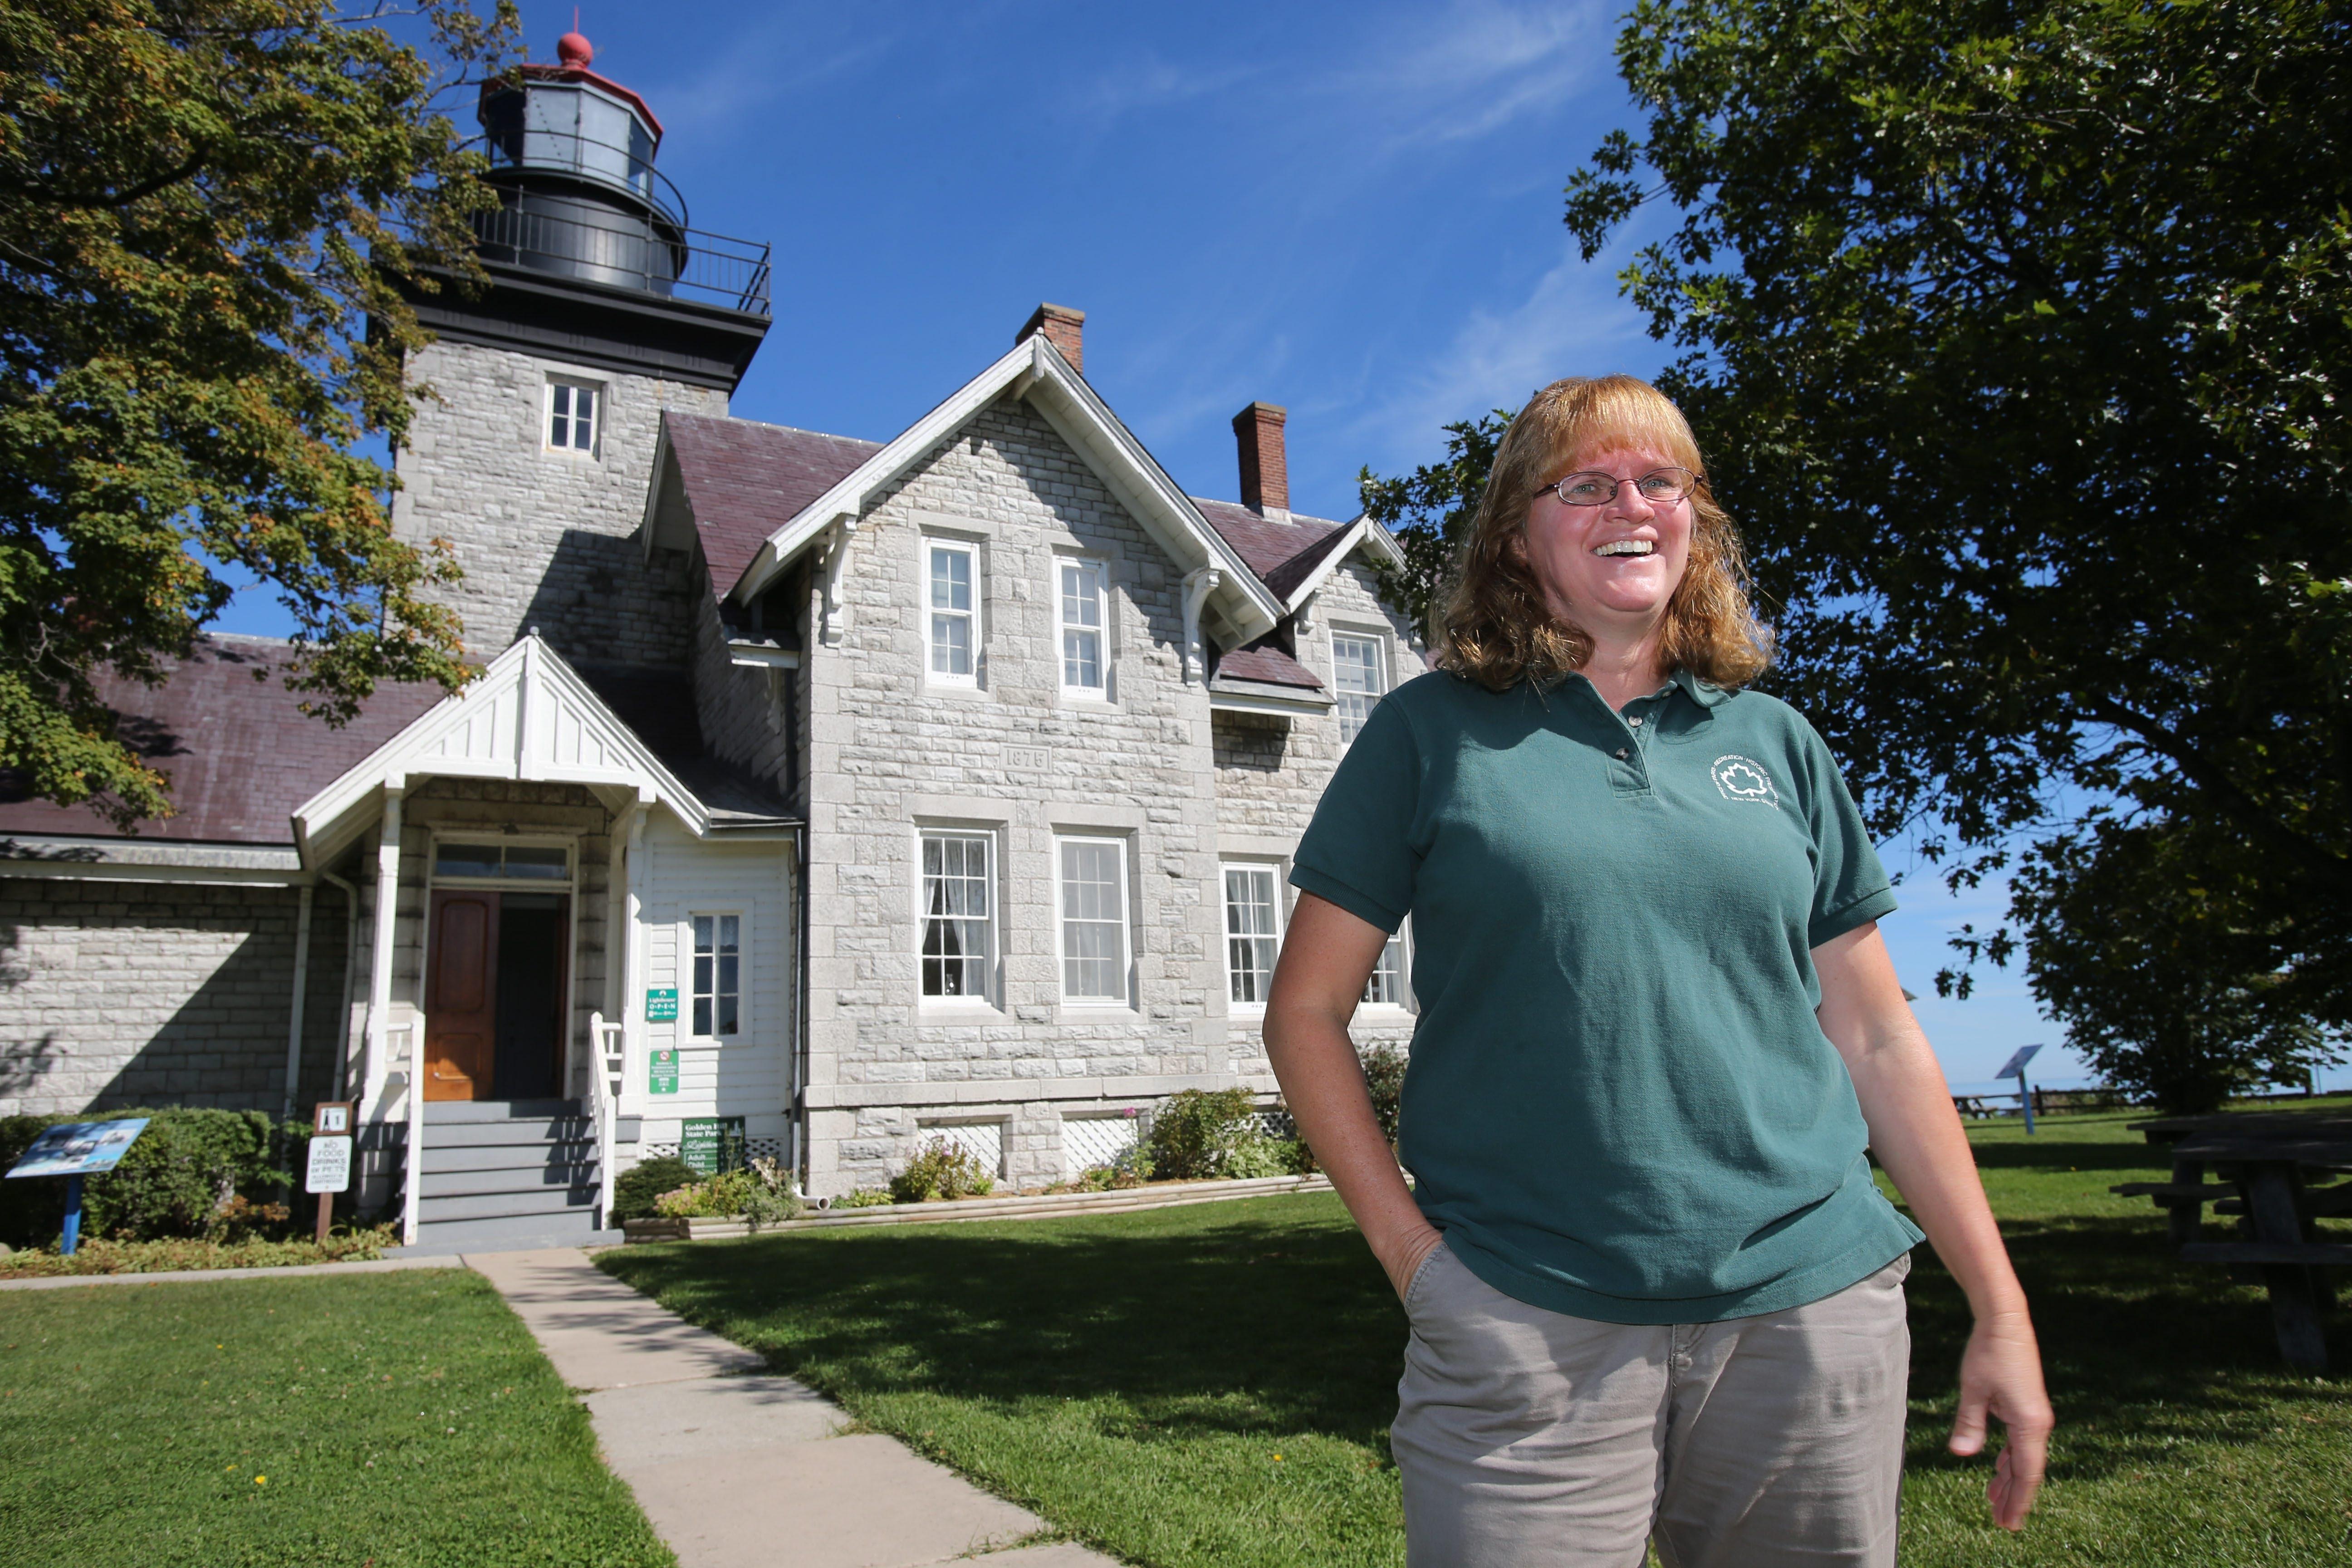 Barbara Larson, President of Friends of the Lighthouse, outside of the 30 Mile Pt. Lighthouse in Golden Hill State Park in Barker, Thursday, September 26, 2013.  (Charles Lewis/Buffalo News)